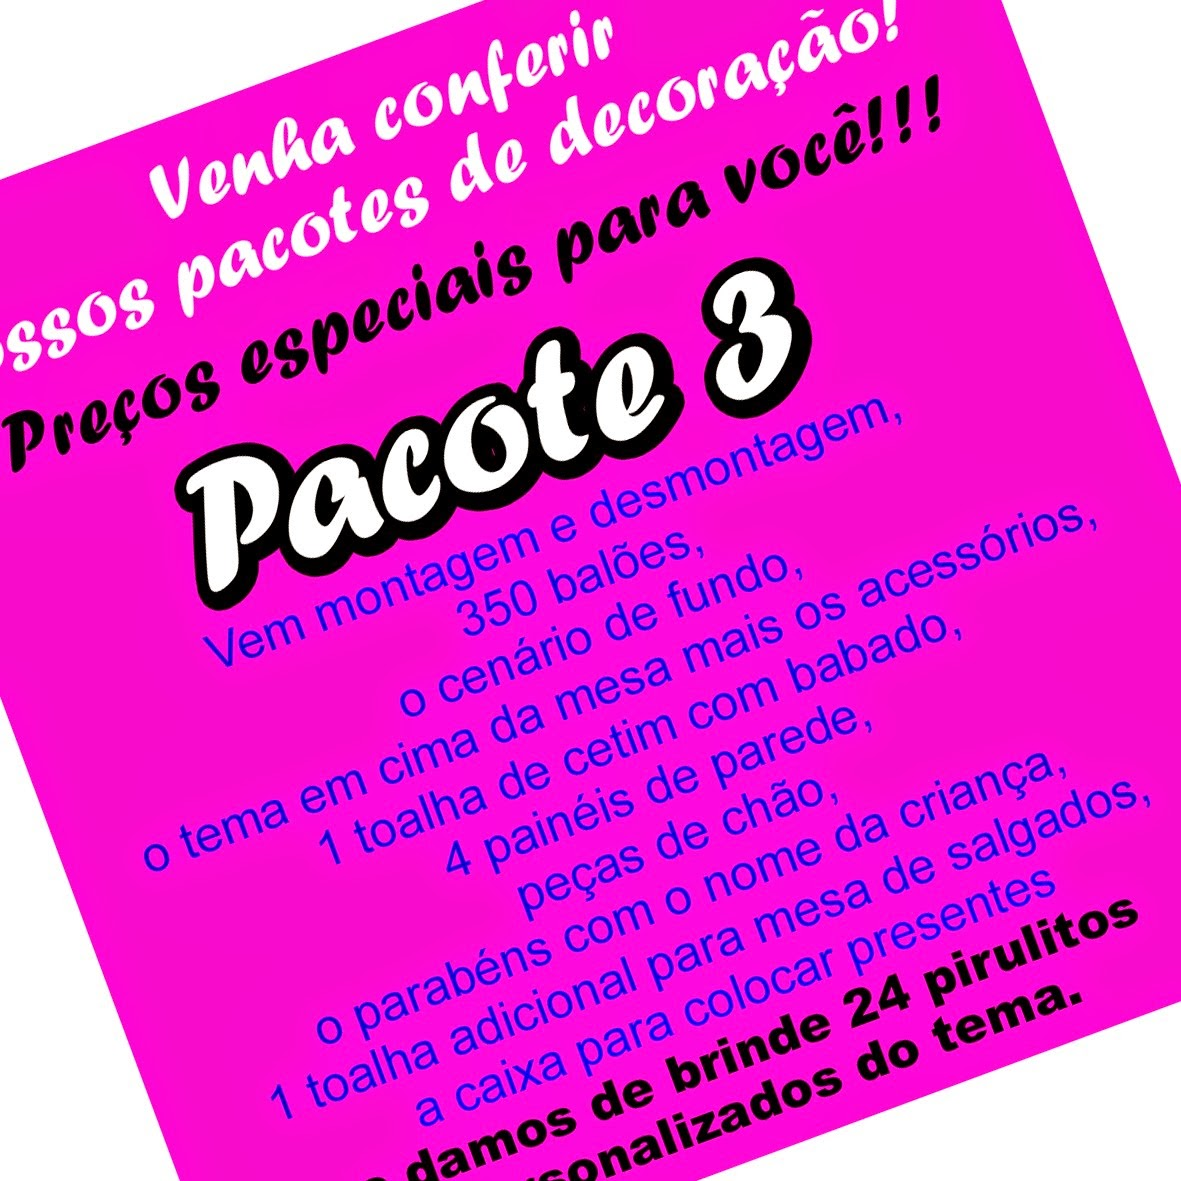 Pacote 3